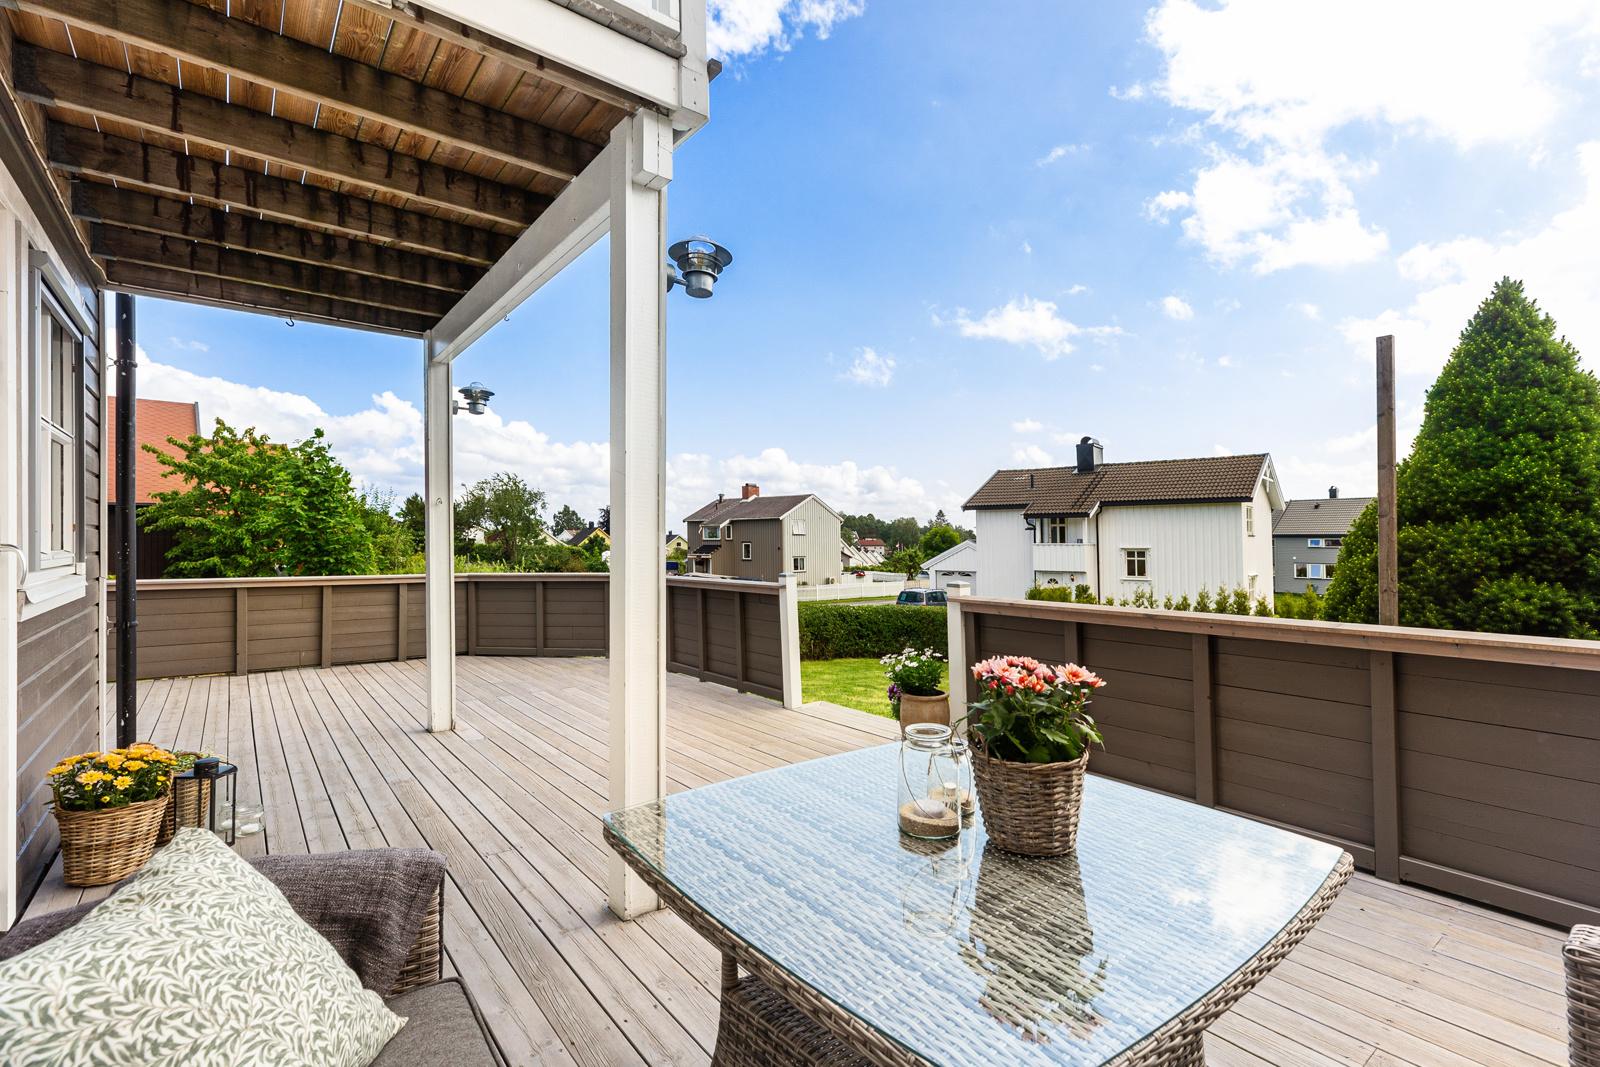 Terrasse med utgang til hagen